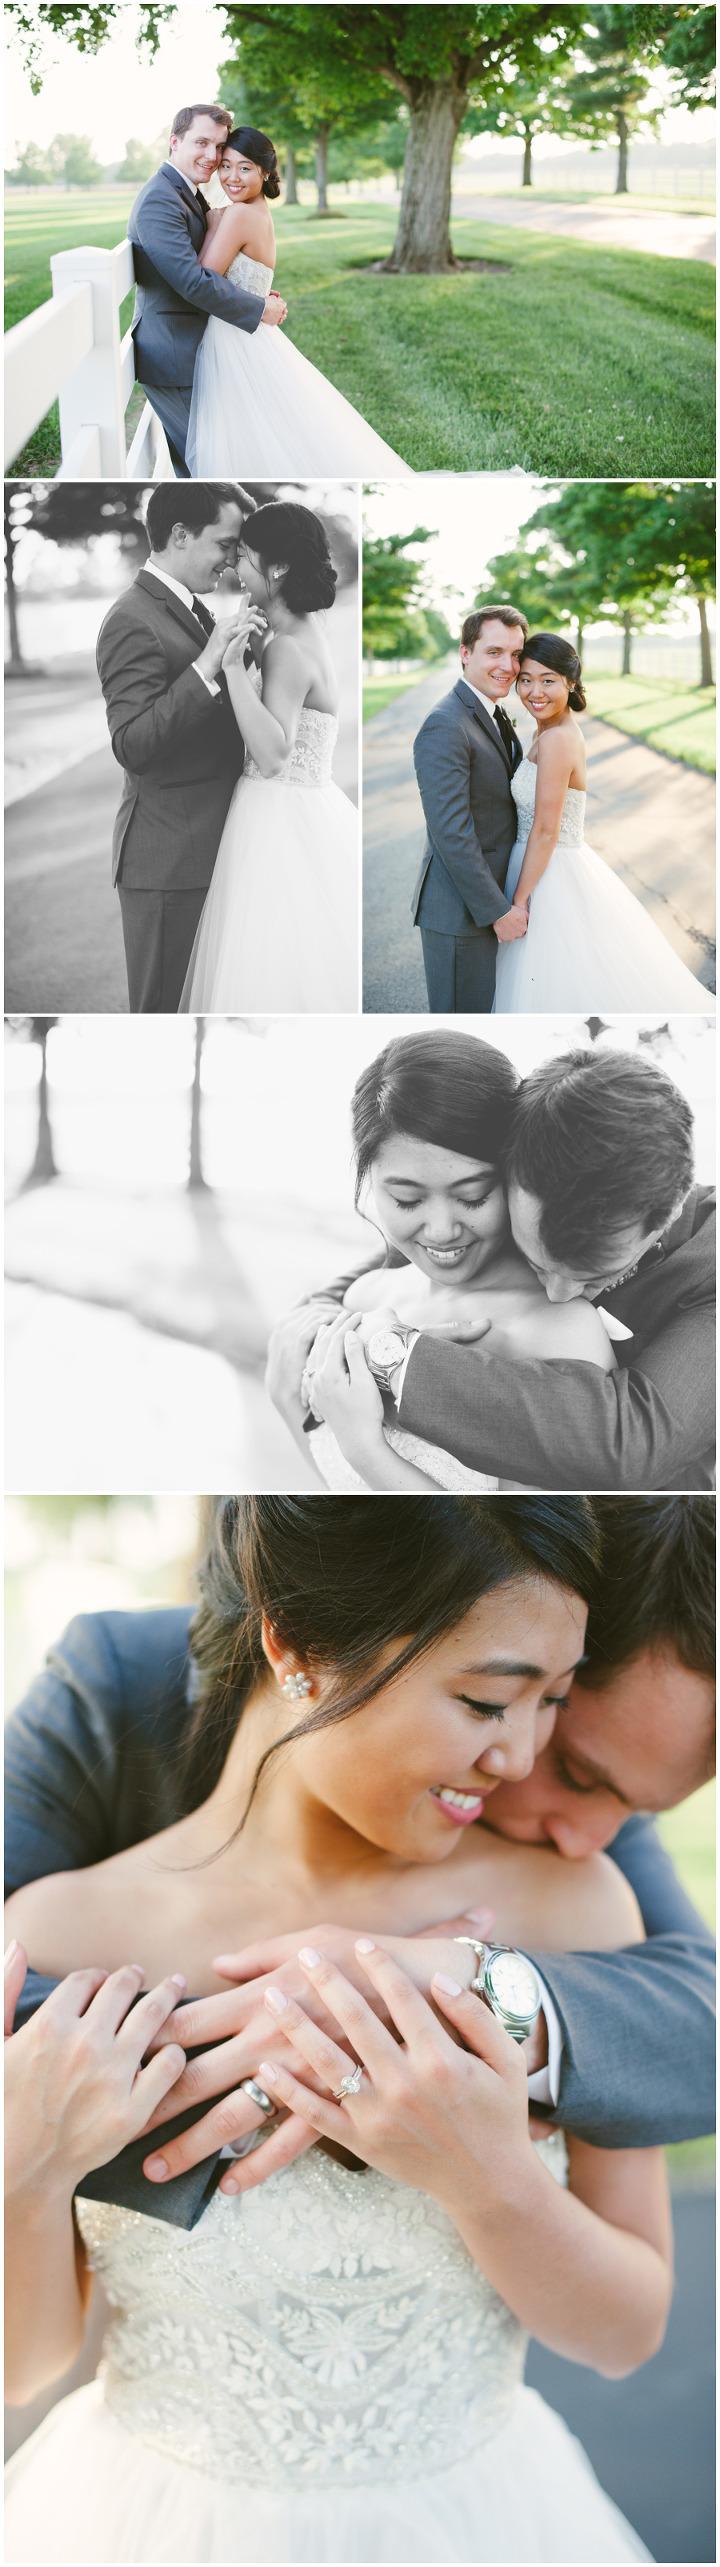 Blog Collage-Ruthie19